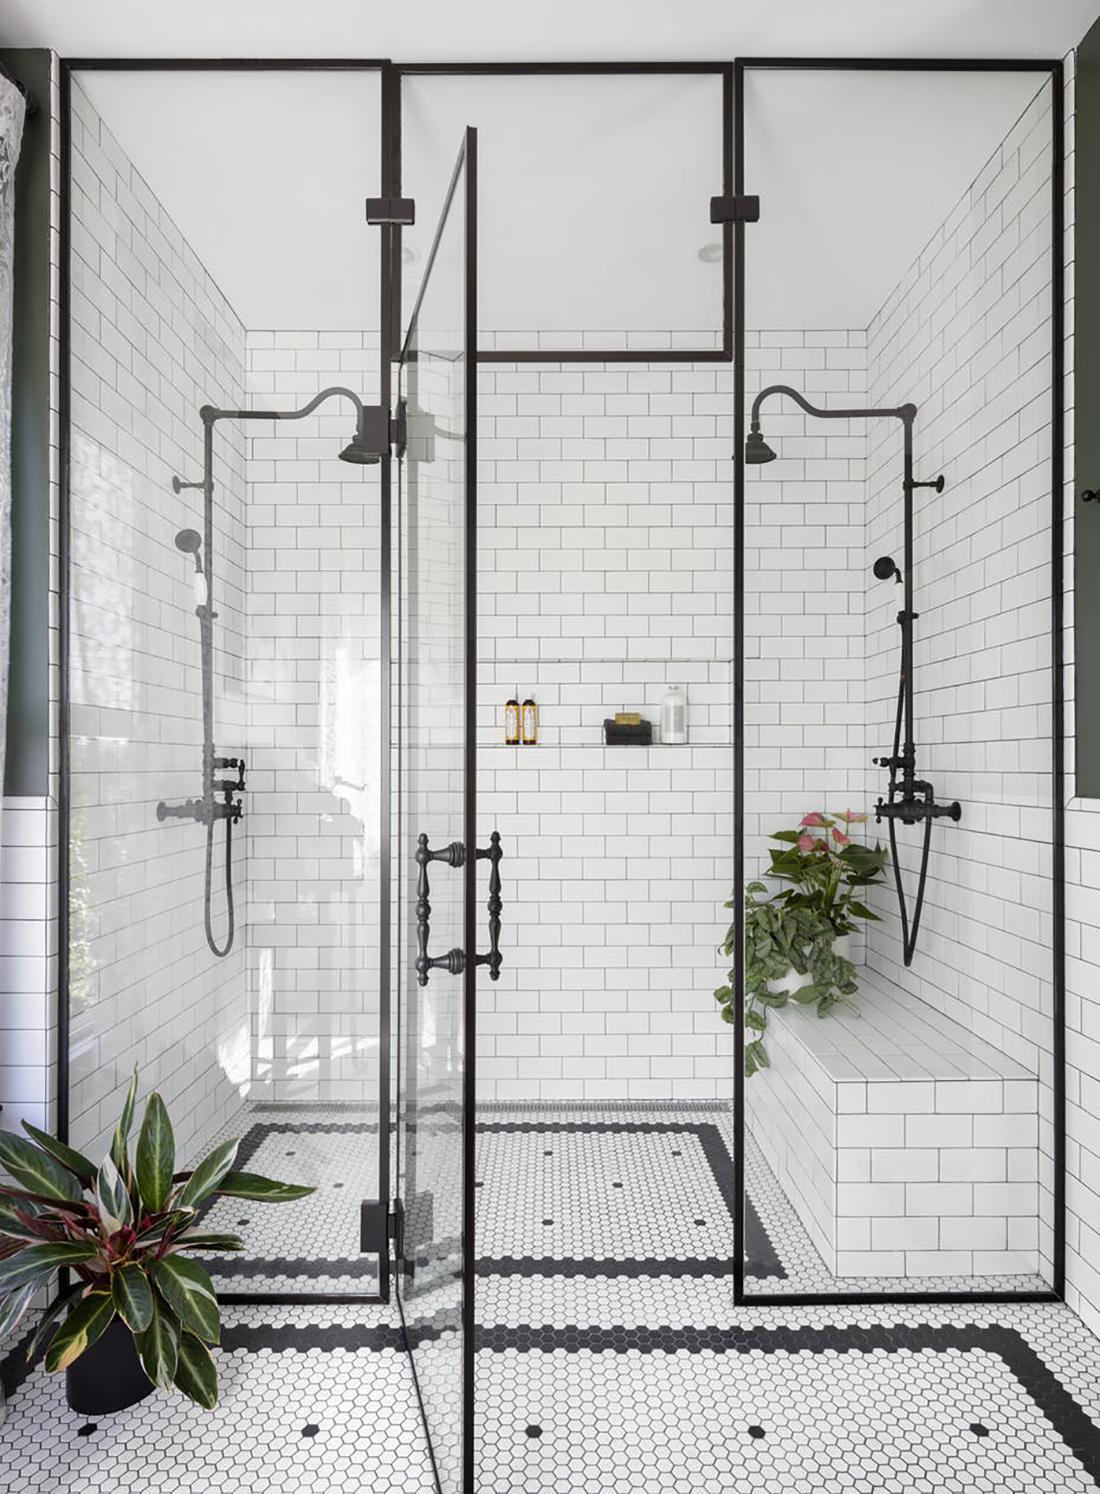 Black and White Bathroom Michelle Dirkse.jpg